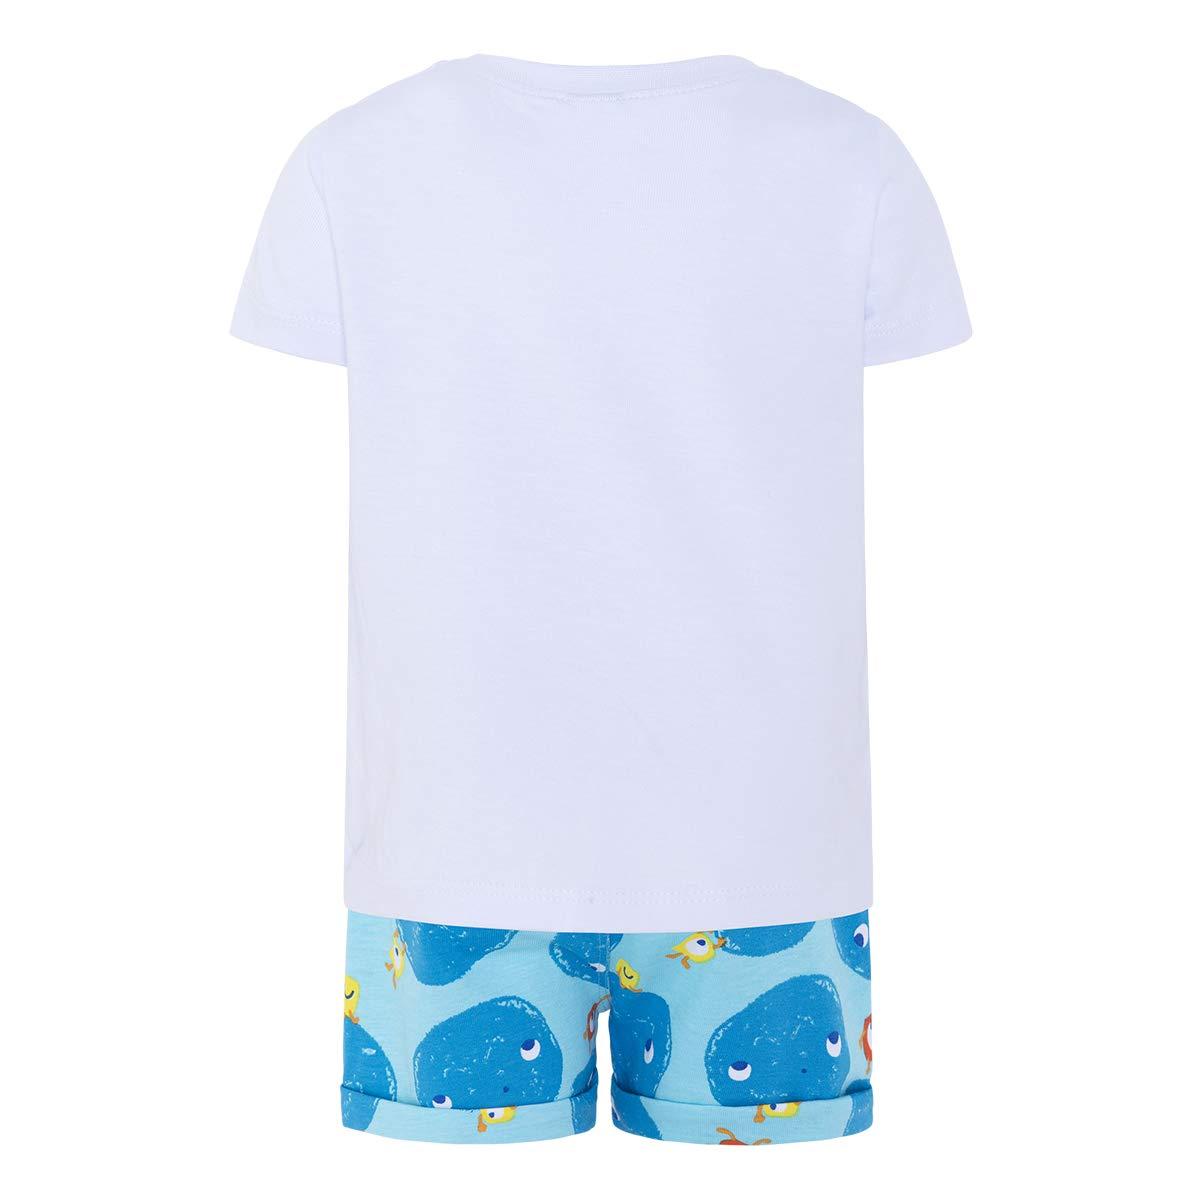 Tuc Tuc Camiseta+Bermuda Punto Estampada Ni/ño Havana/&frien Completino Bimbo